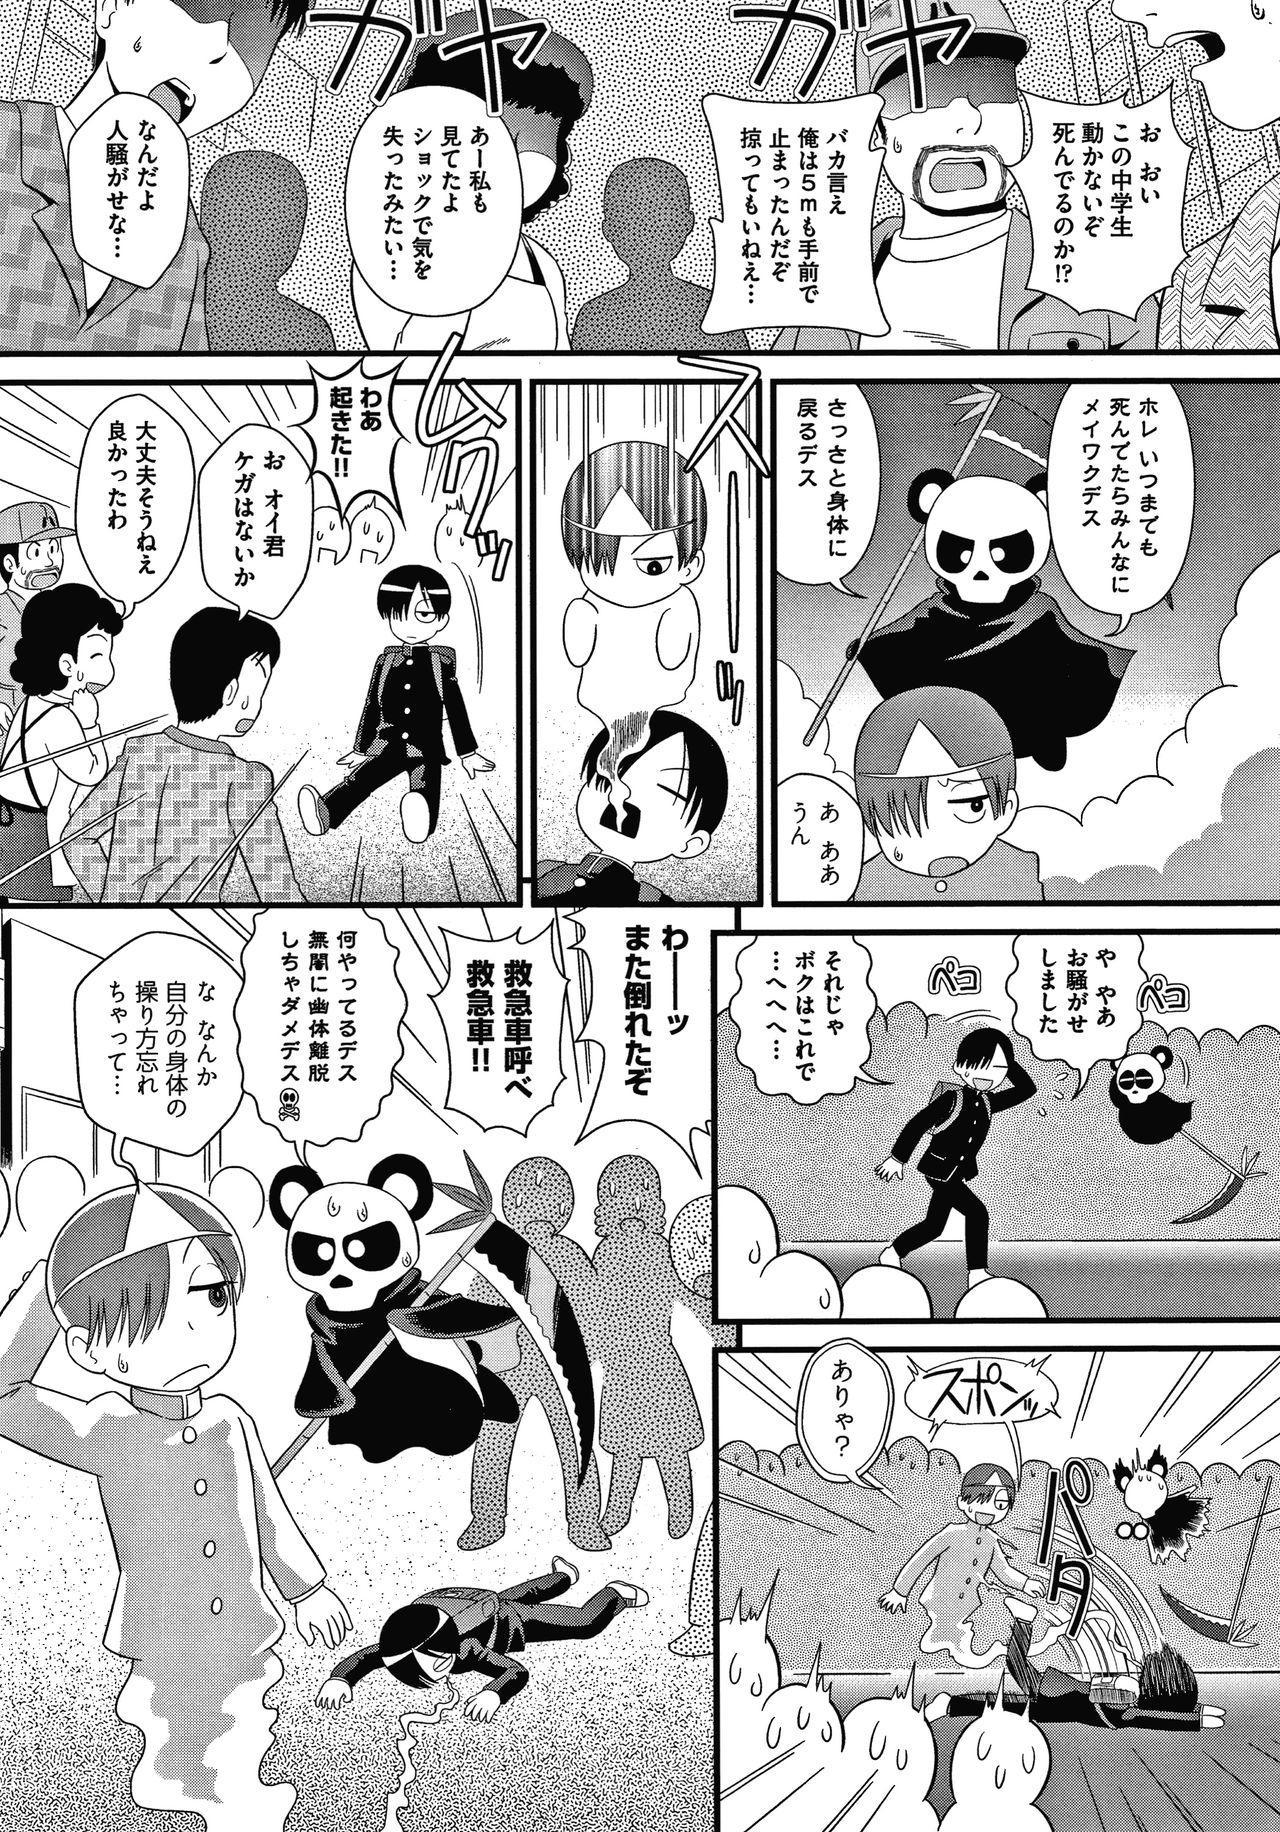 Shoujo Kumikyoku 15 5